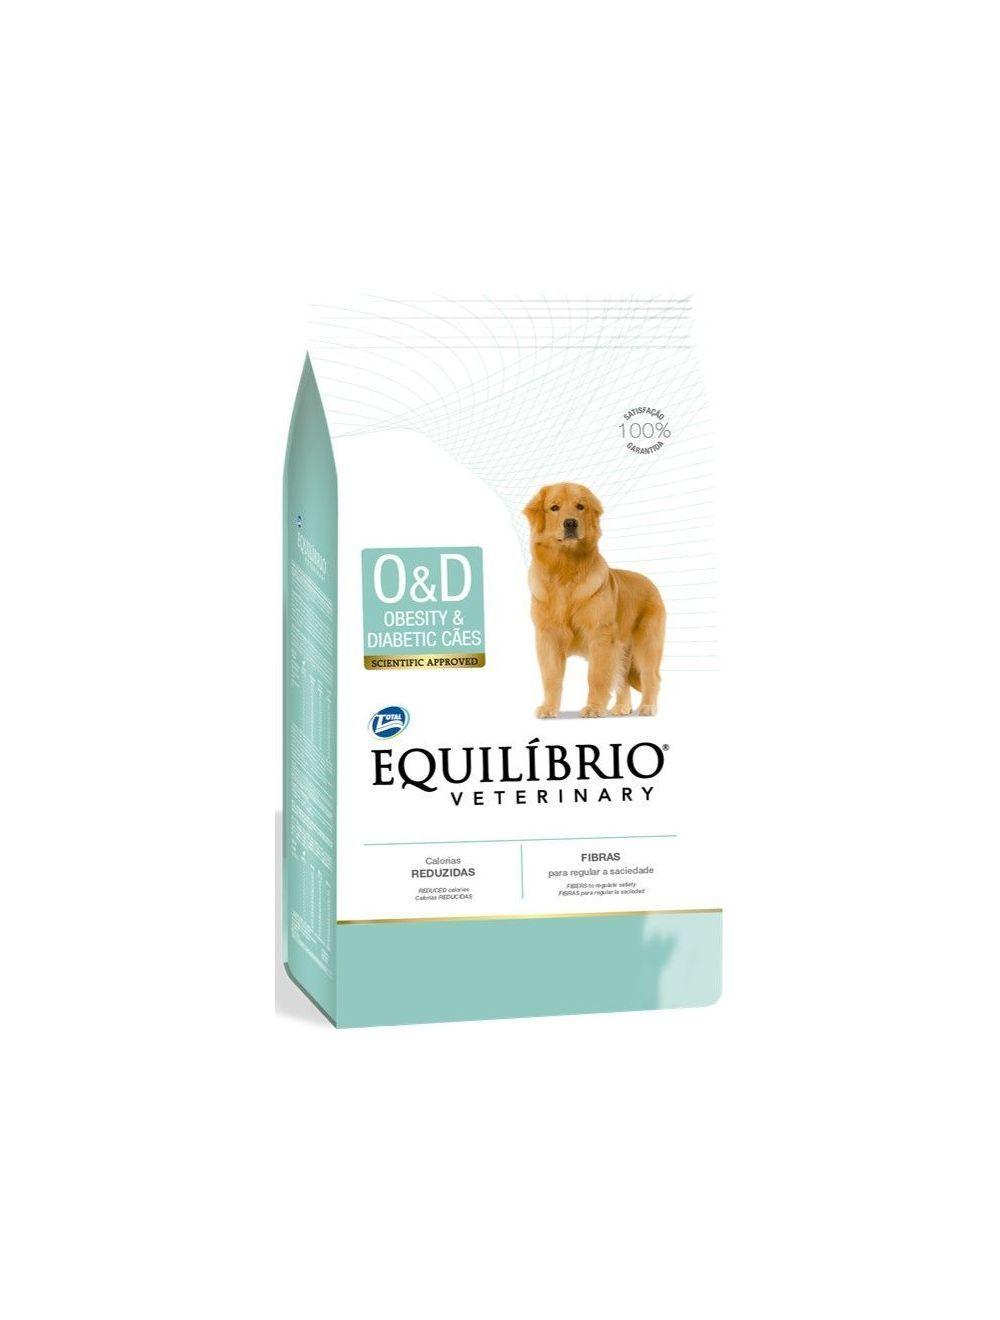 Equilibrio Perro Veterinary Obesity And Diabetic